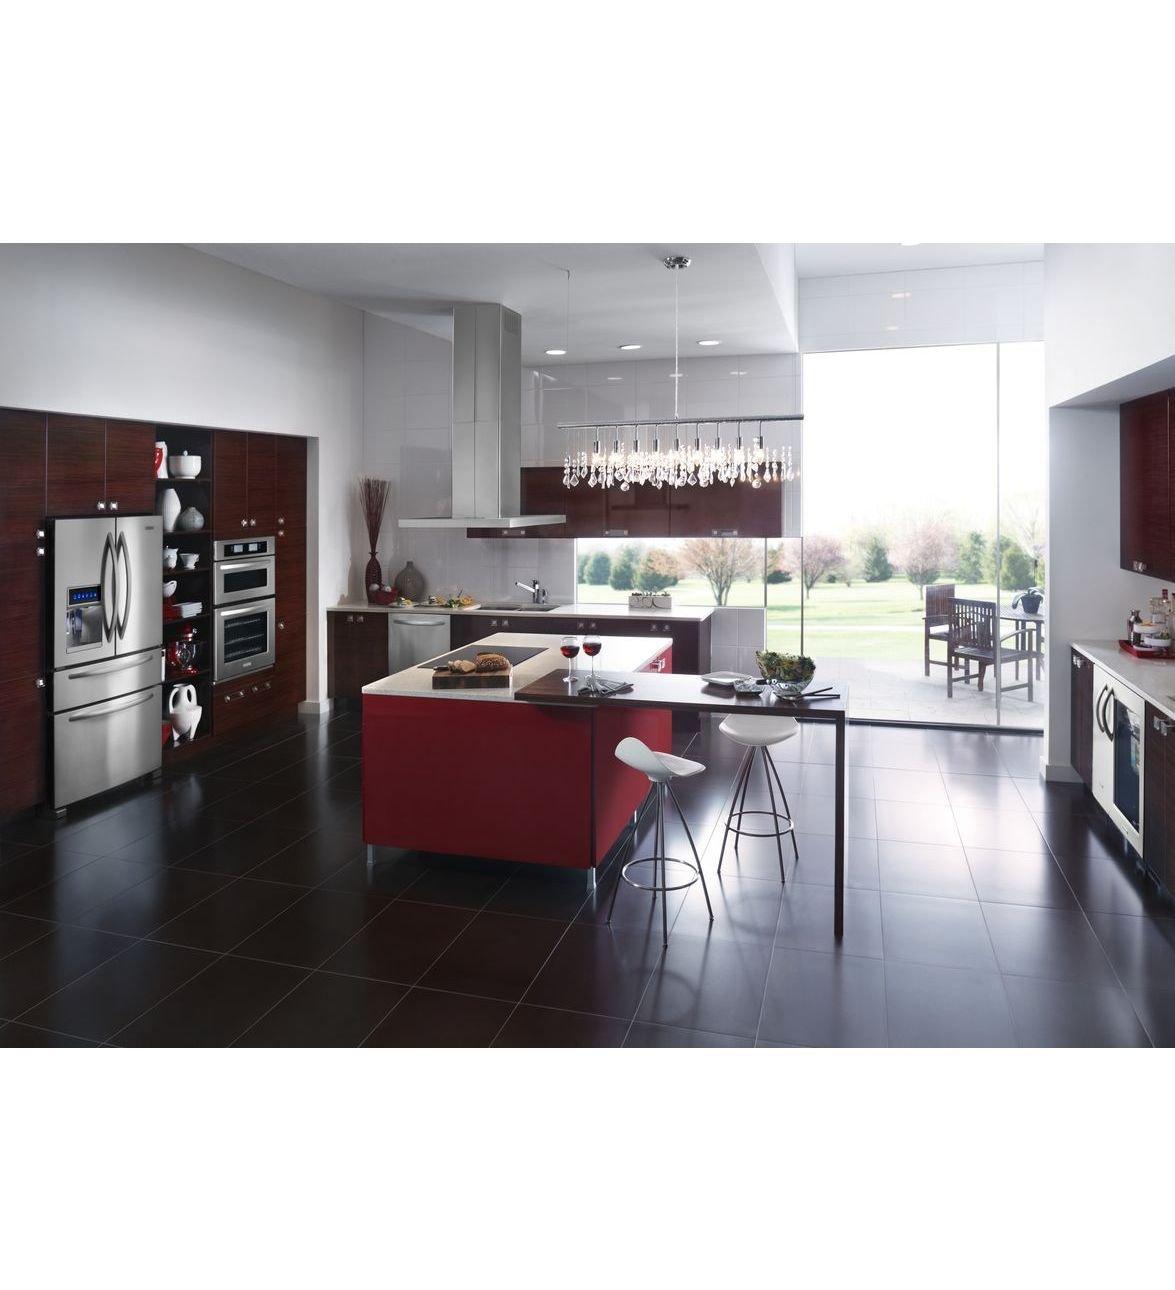 KitchenAid KFXS25RY[MS]